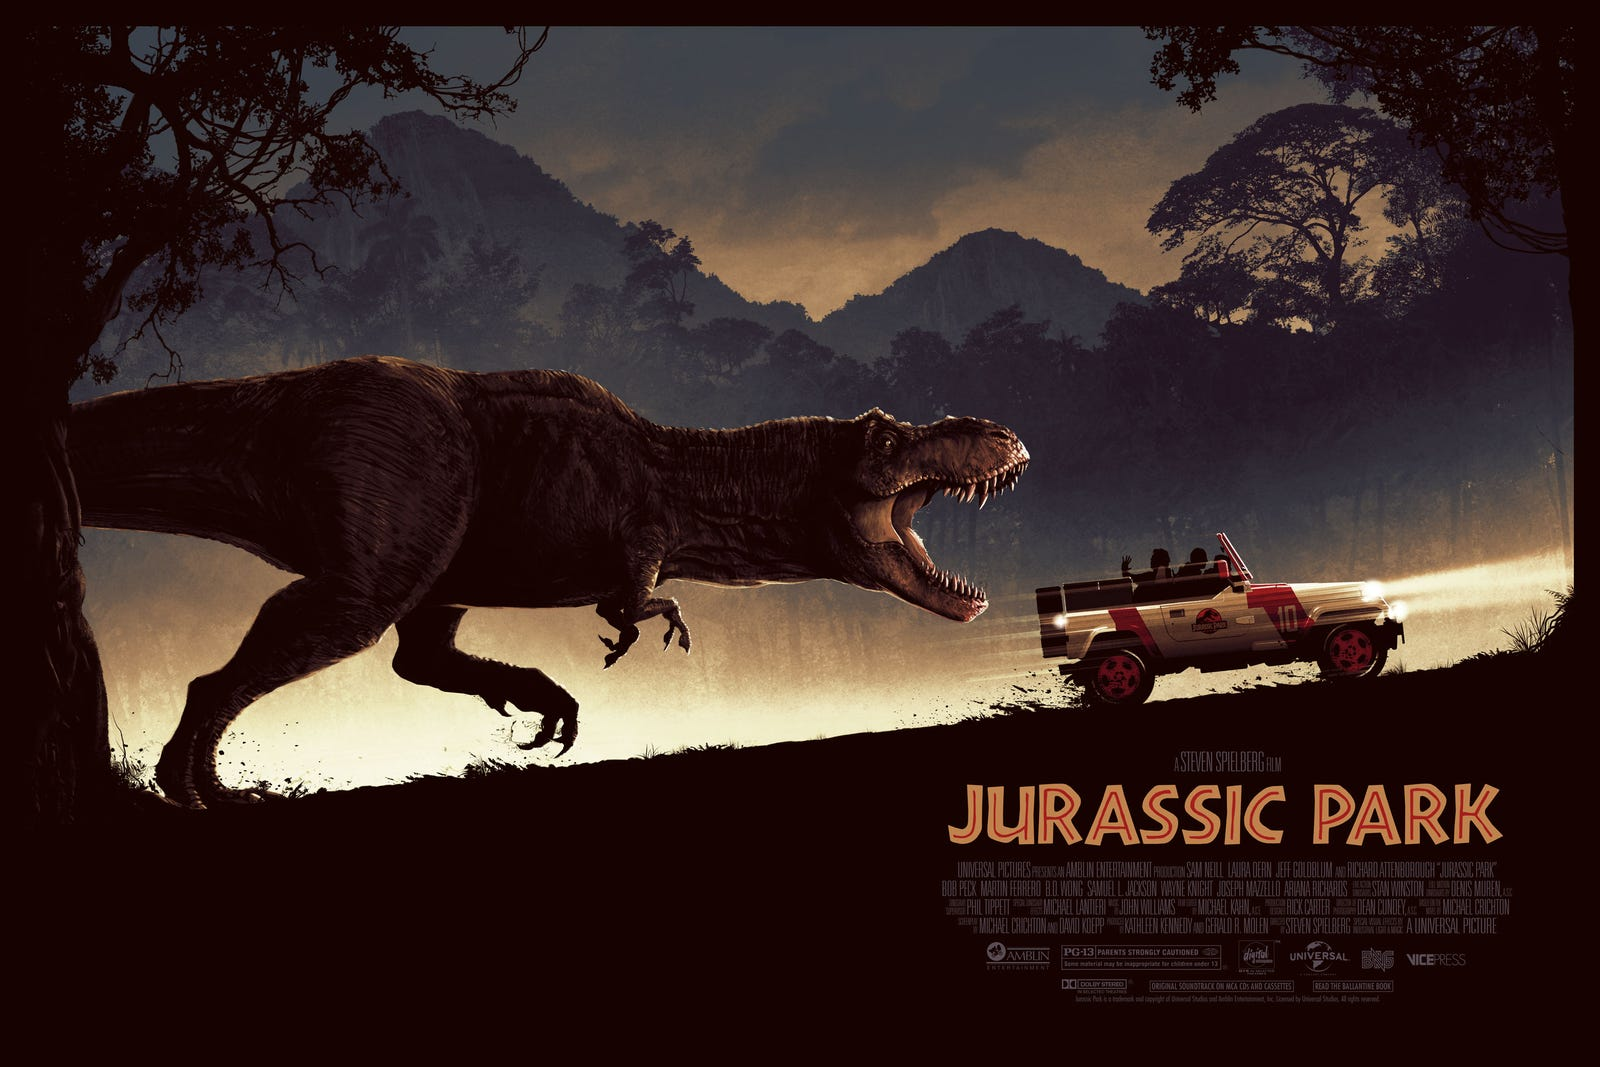 Matt Ferguson's Jurassic Park. A variant is also available.